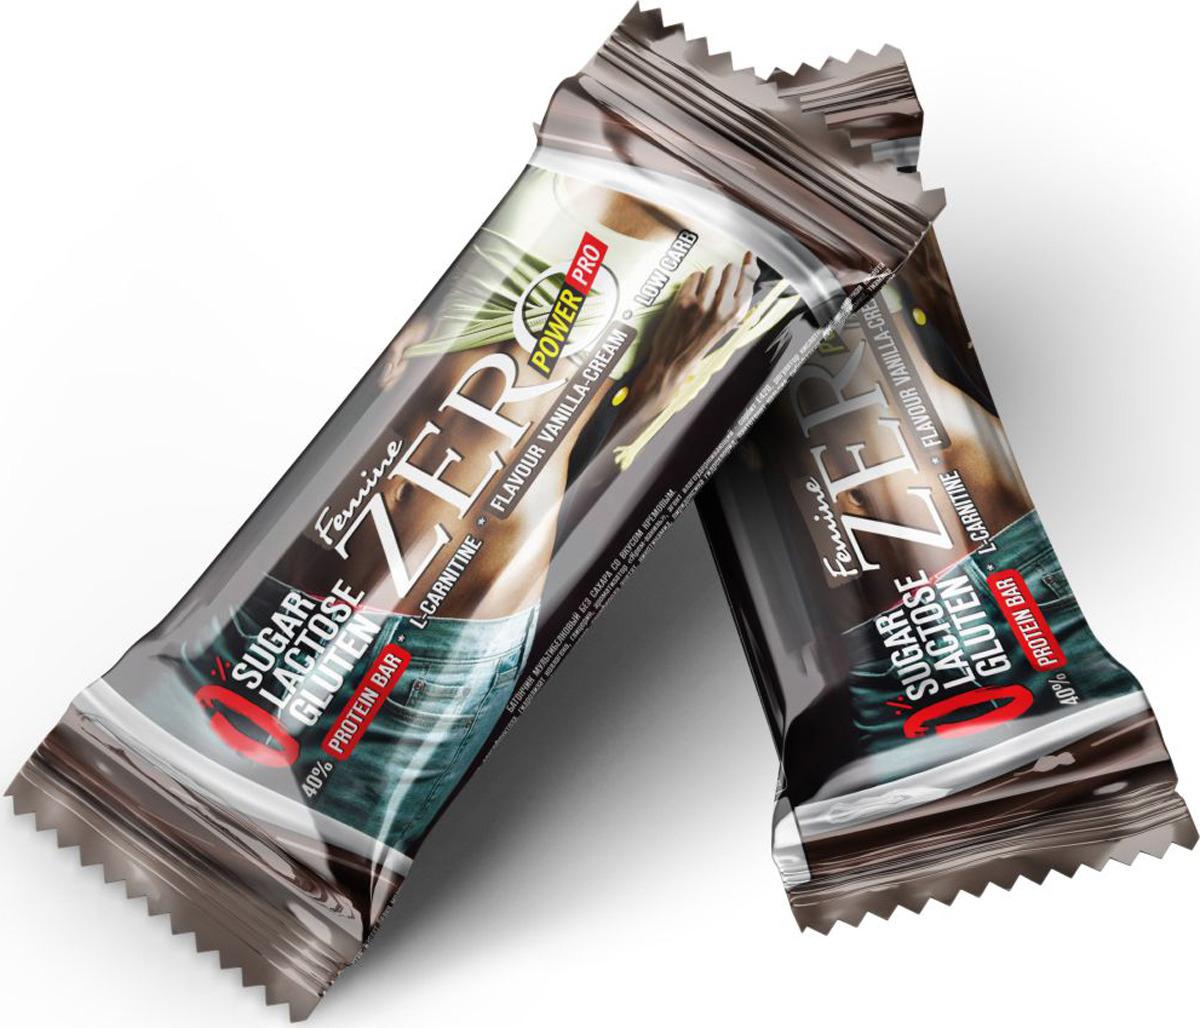 Протеиновый батончик Power Pro Protein Bar Zero Femine мультибелковый без сахара со вкусом Vanilla-Cream, 50 г